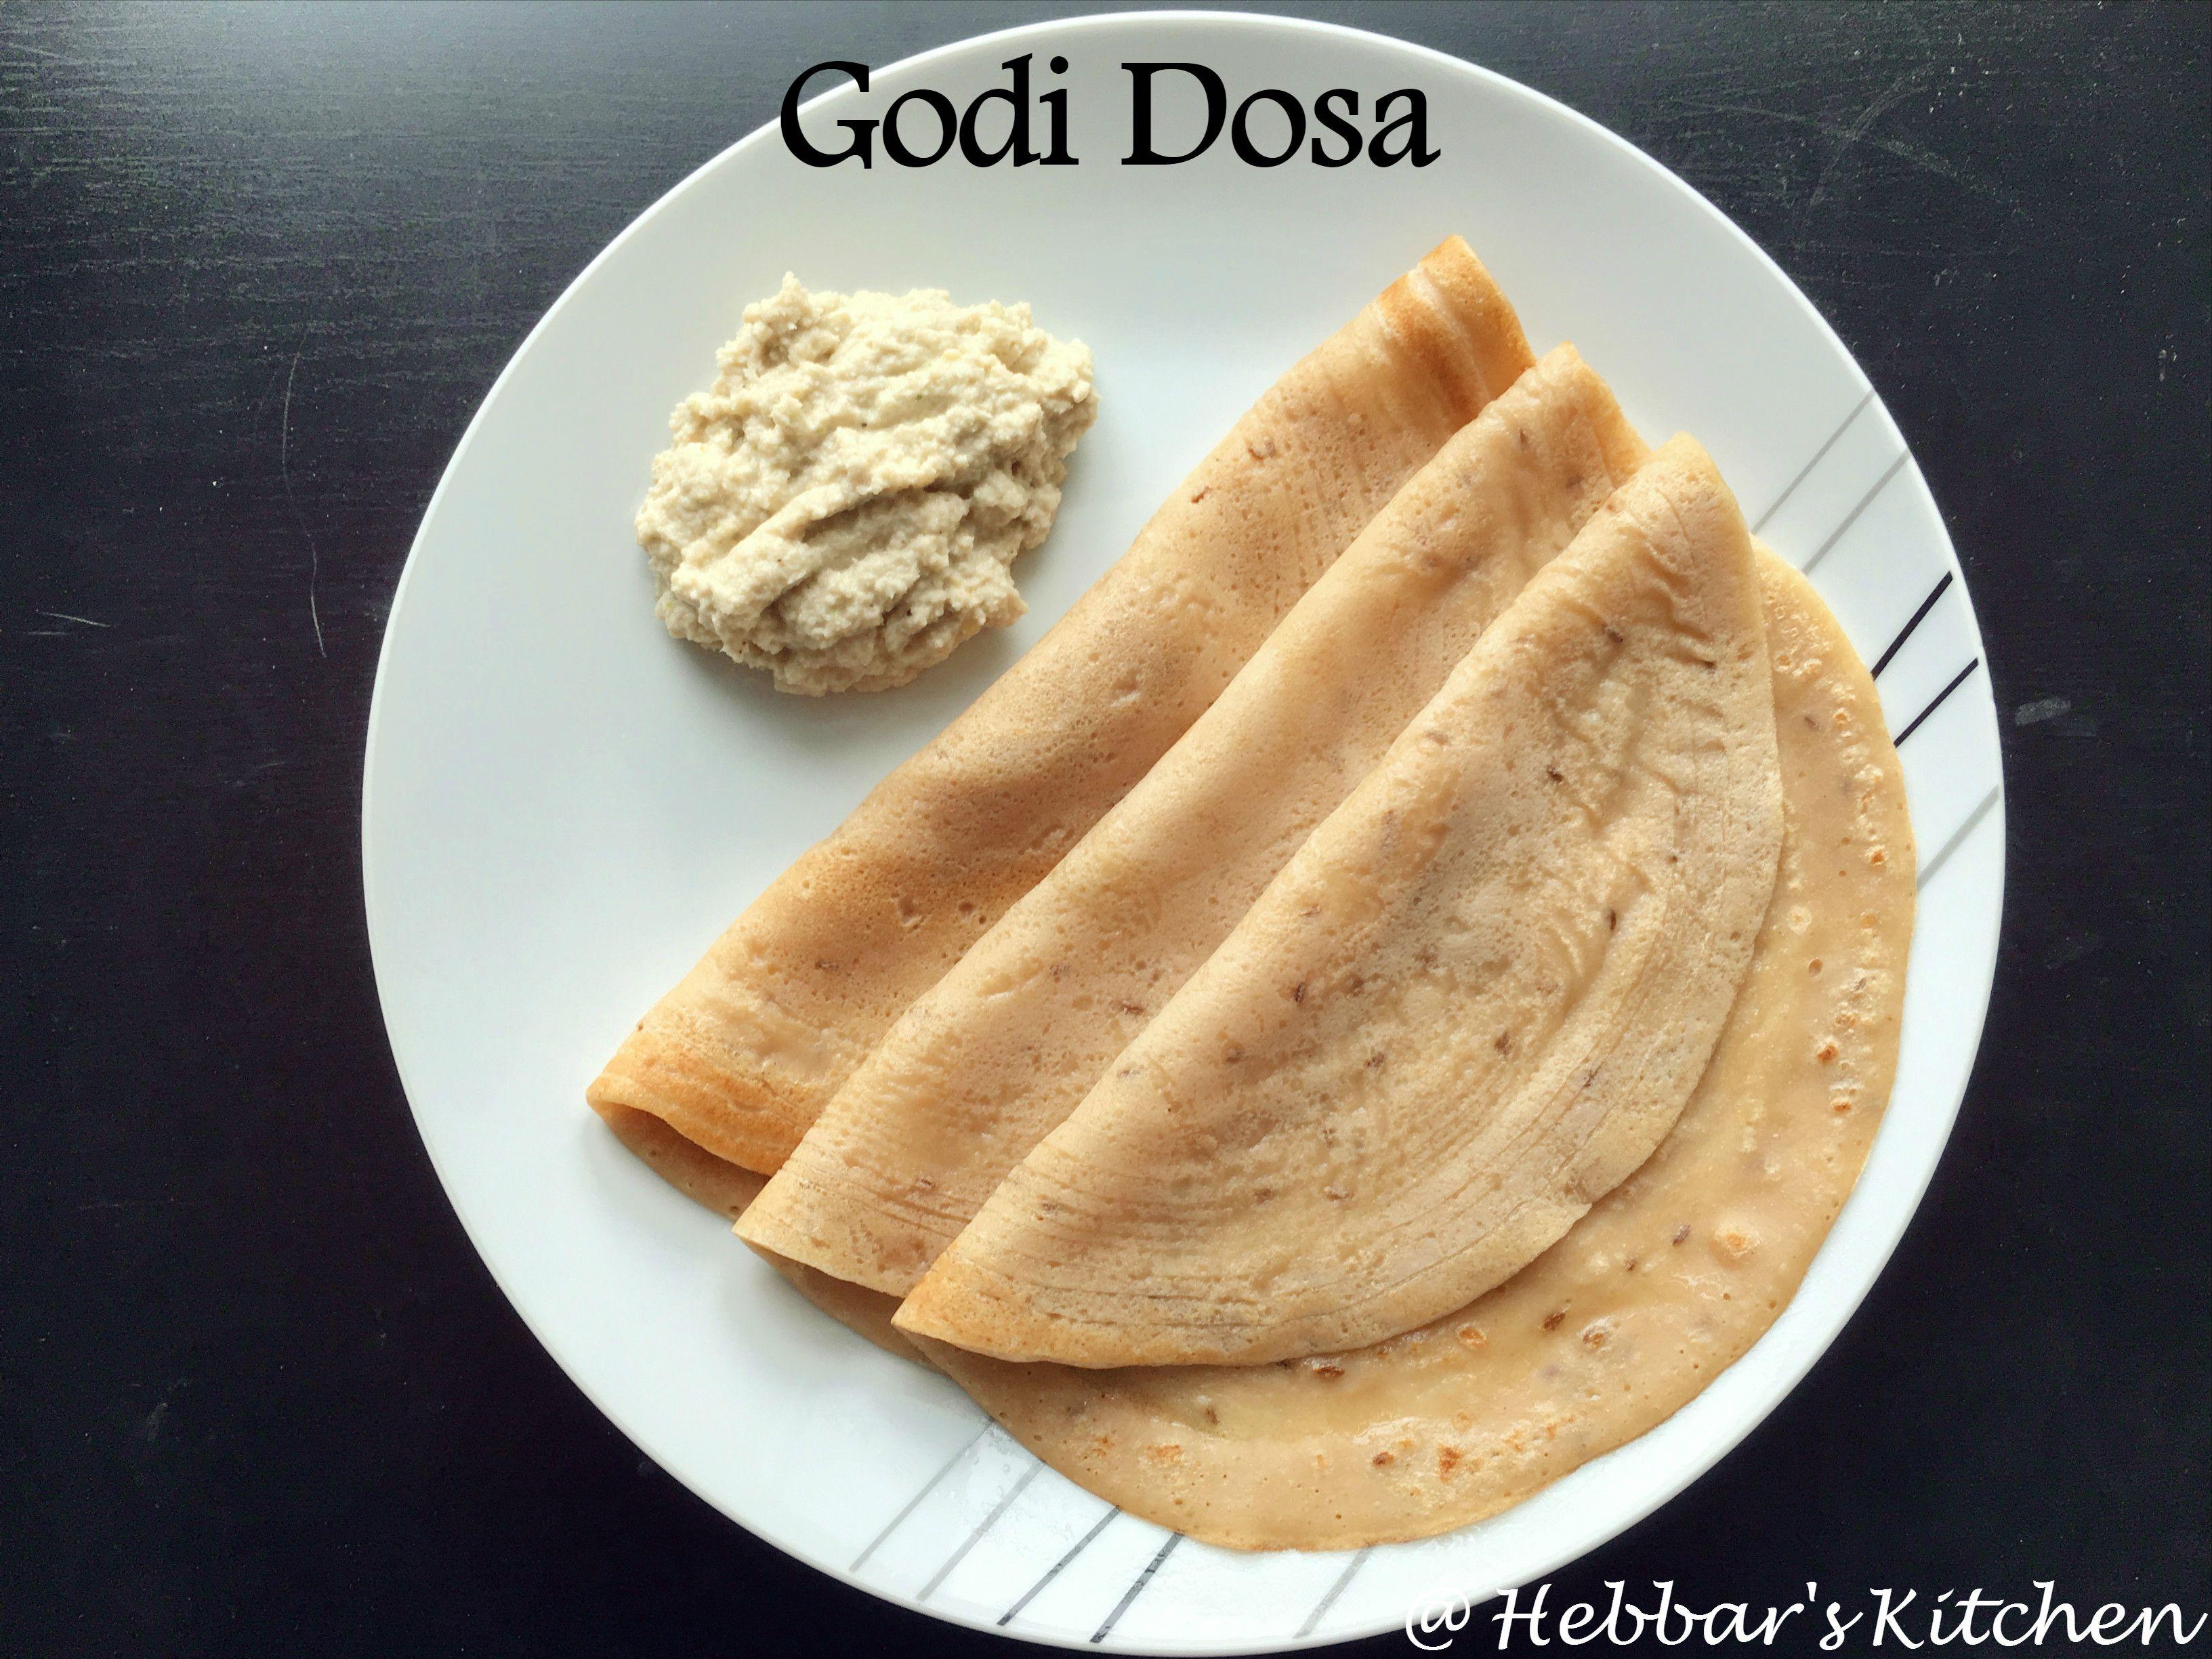 Godi dosa recipes pinterest indian breakfast dinners and recipes food godi dosa dosa recipeindian forumfinder Choice Image